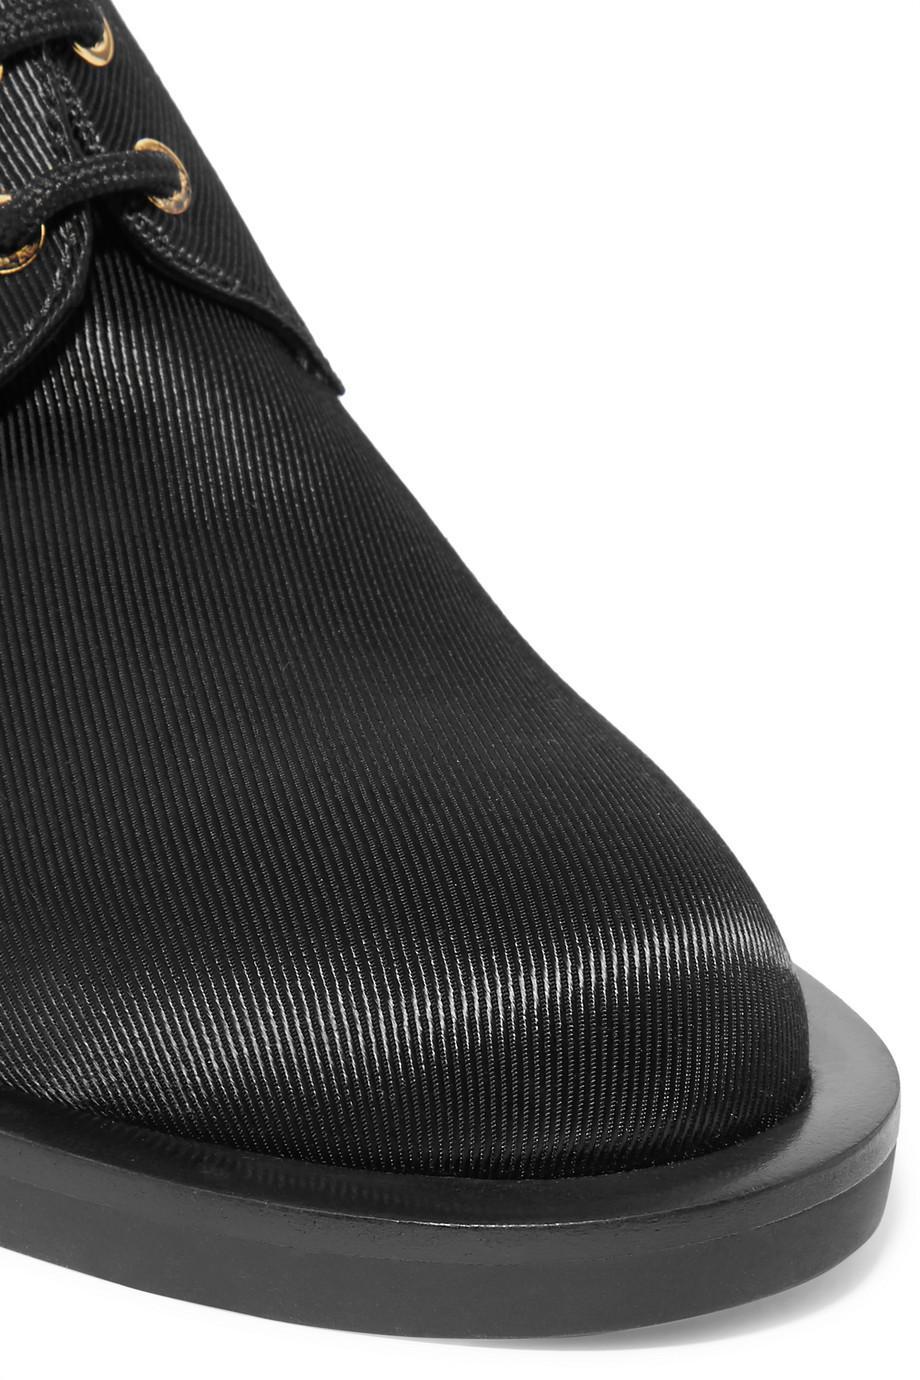 For Sale Finishline Choice Sale Online Casati Embellished Satin-drill Brogues - Black Nicholas Kirkwood s2ccfuEX